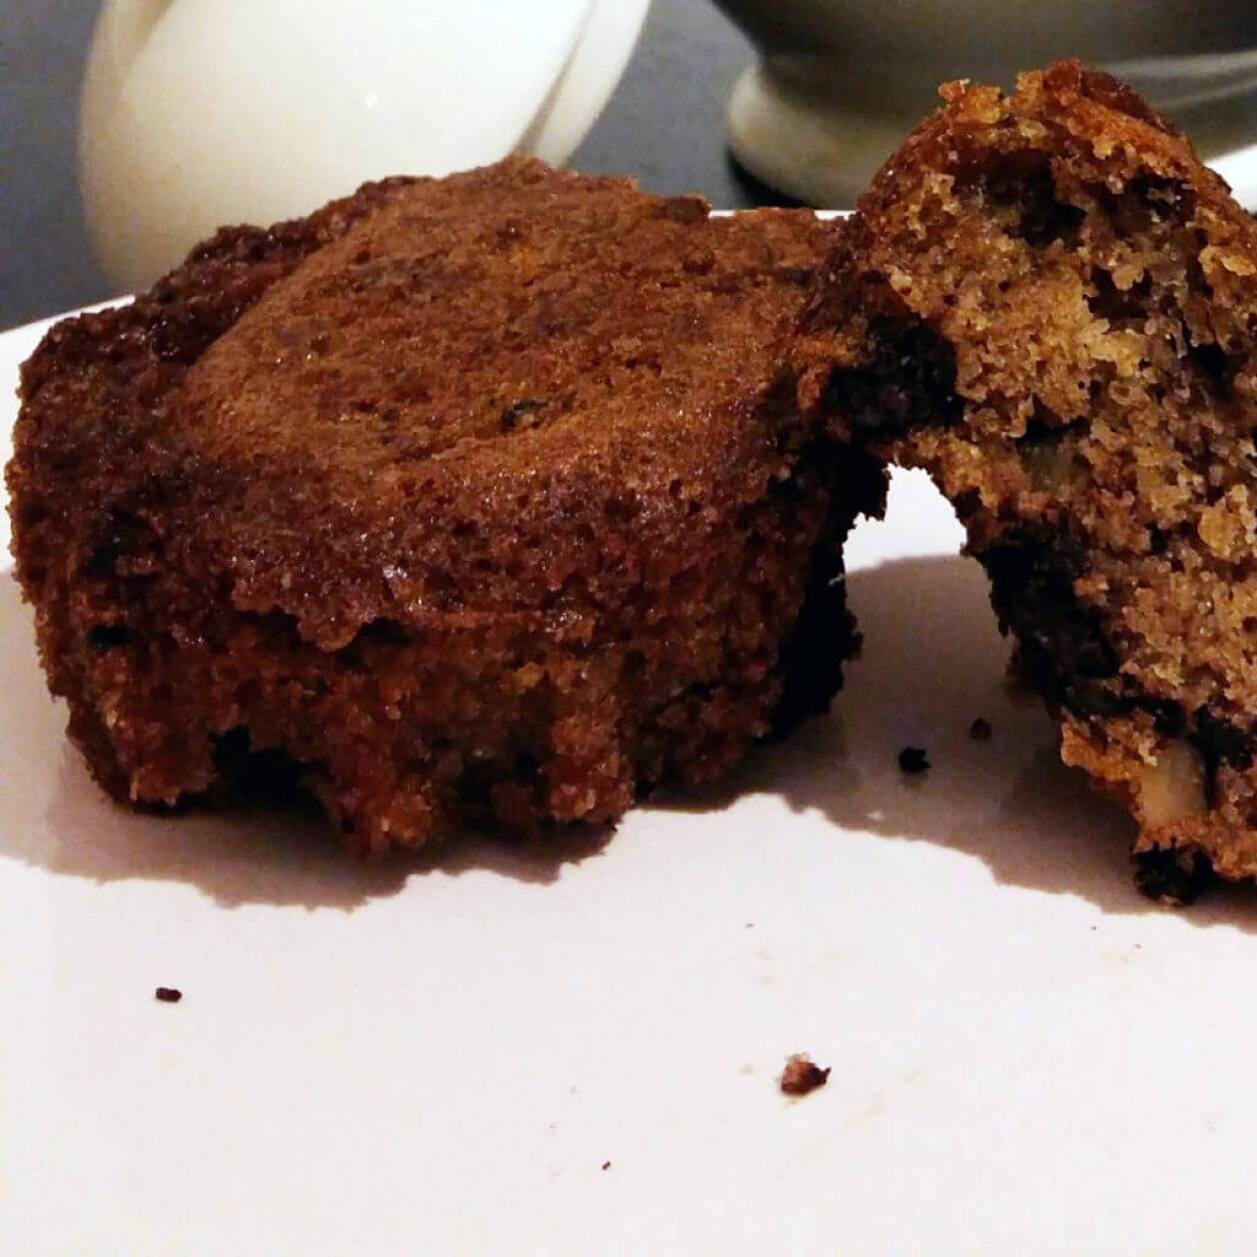 muffin ontbijtje mamameteenblog.nl 3